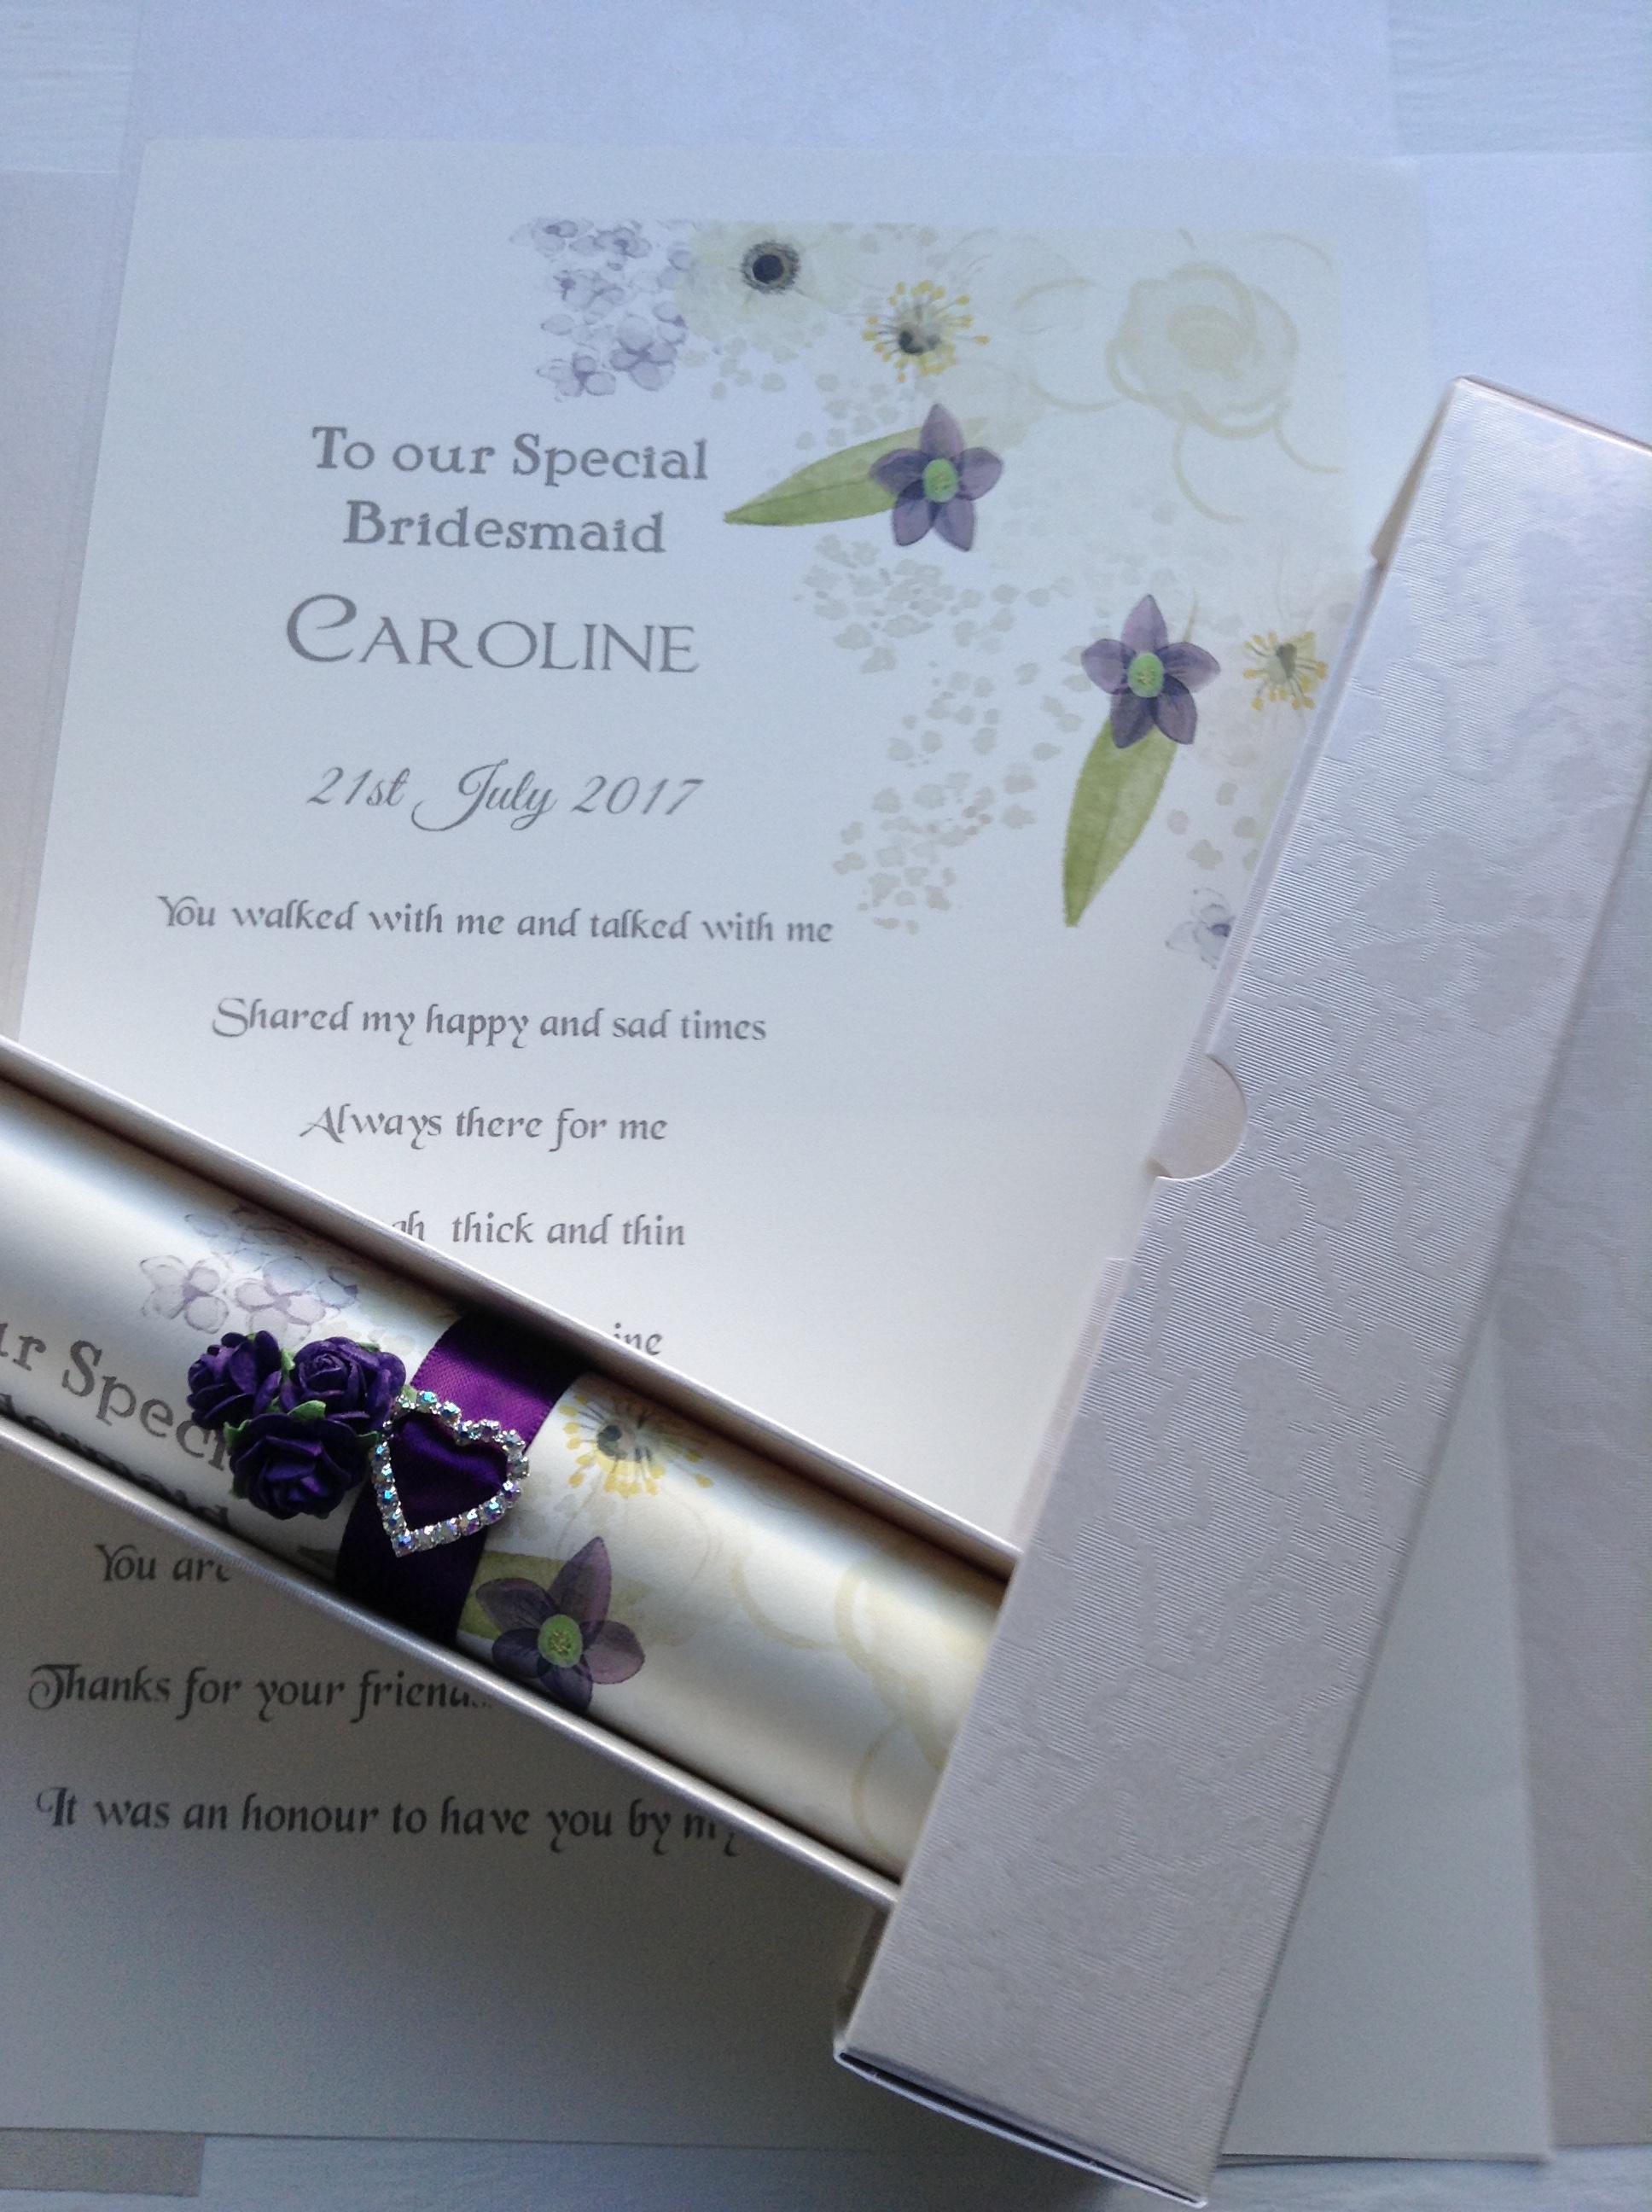 A4 scroll using purple